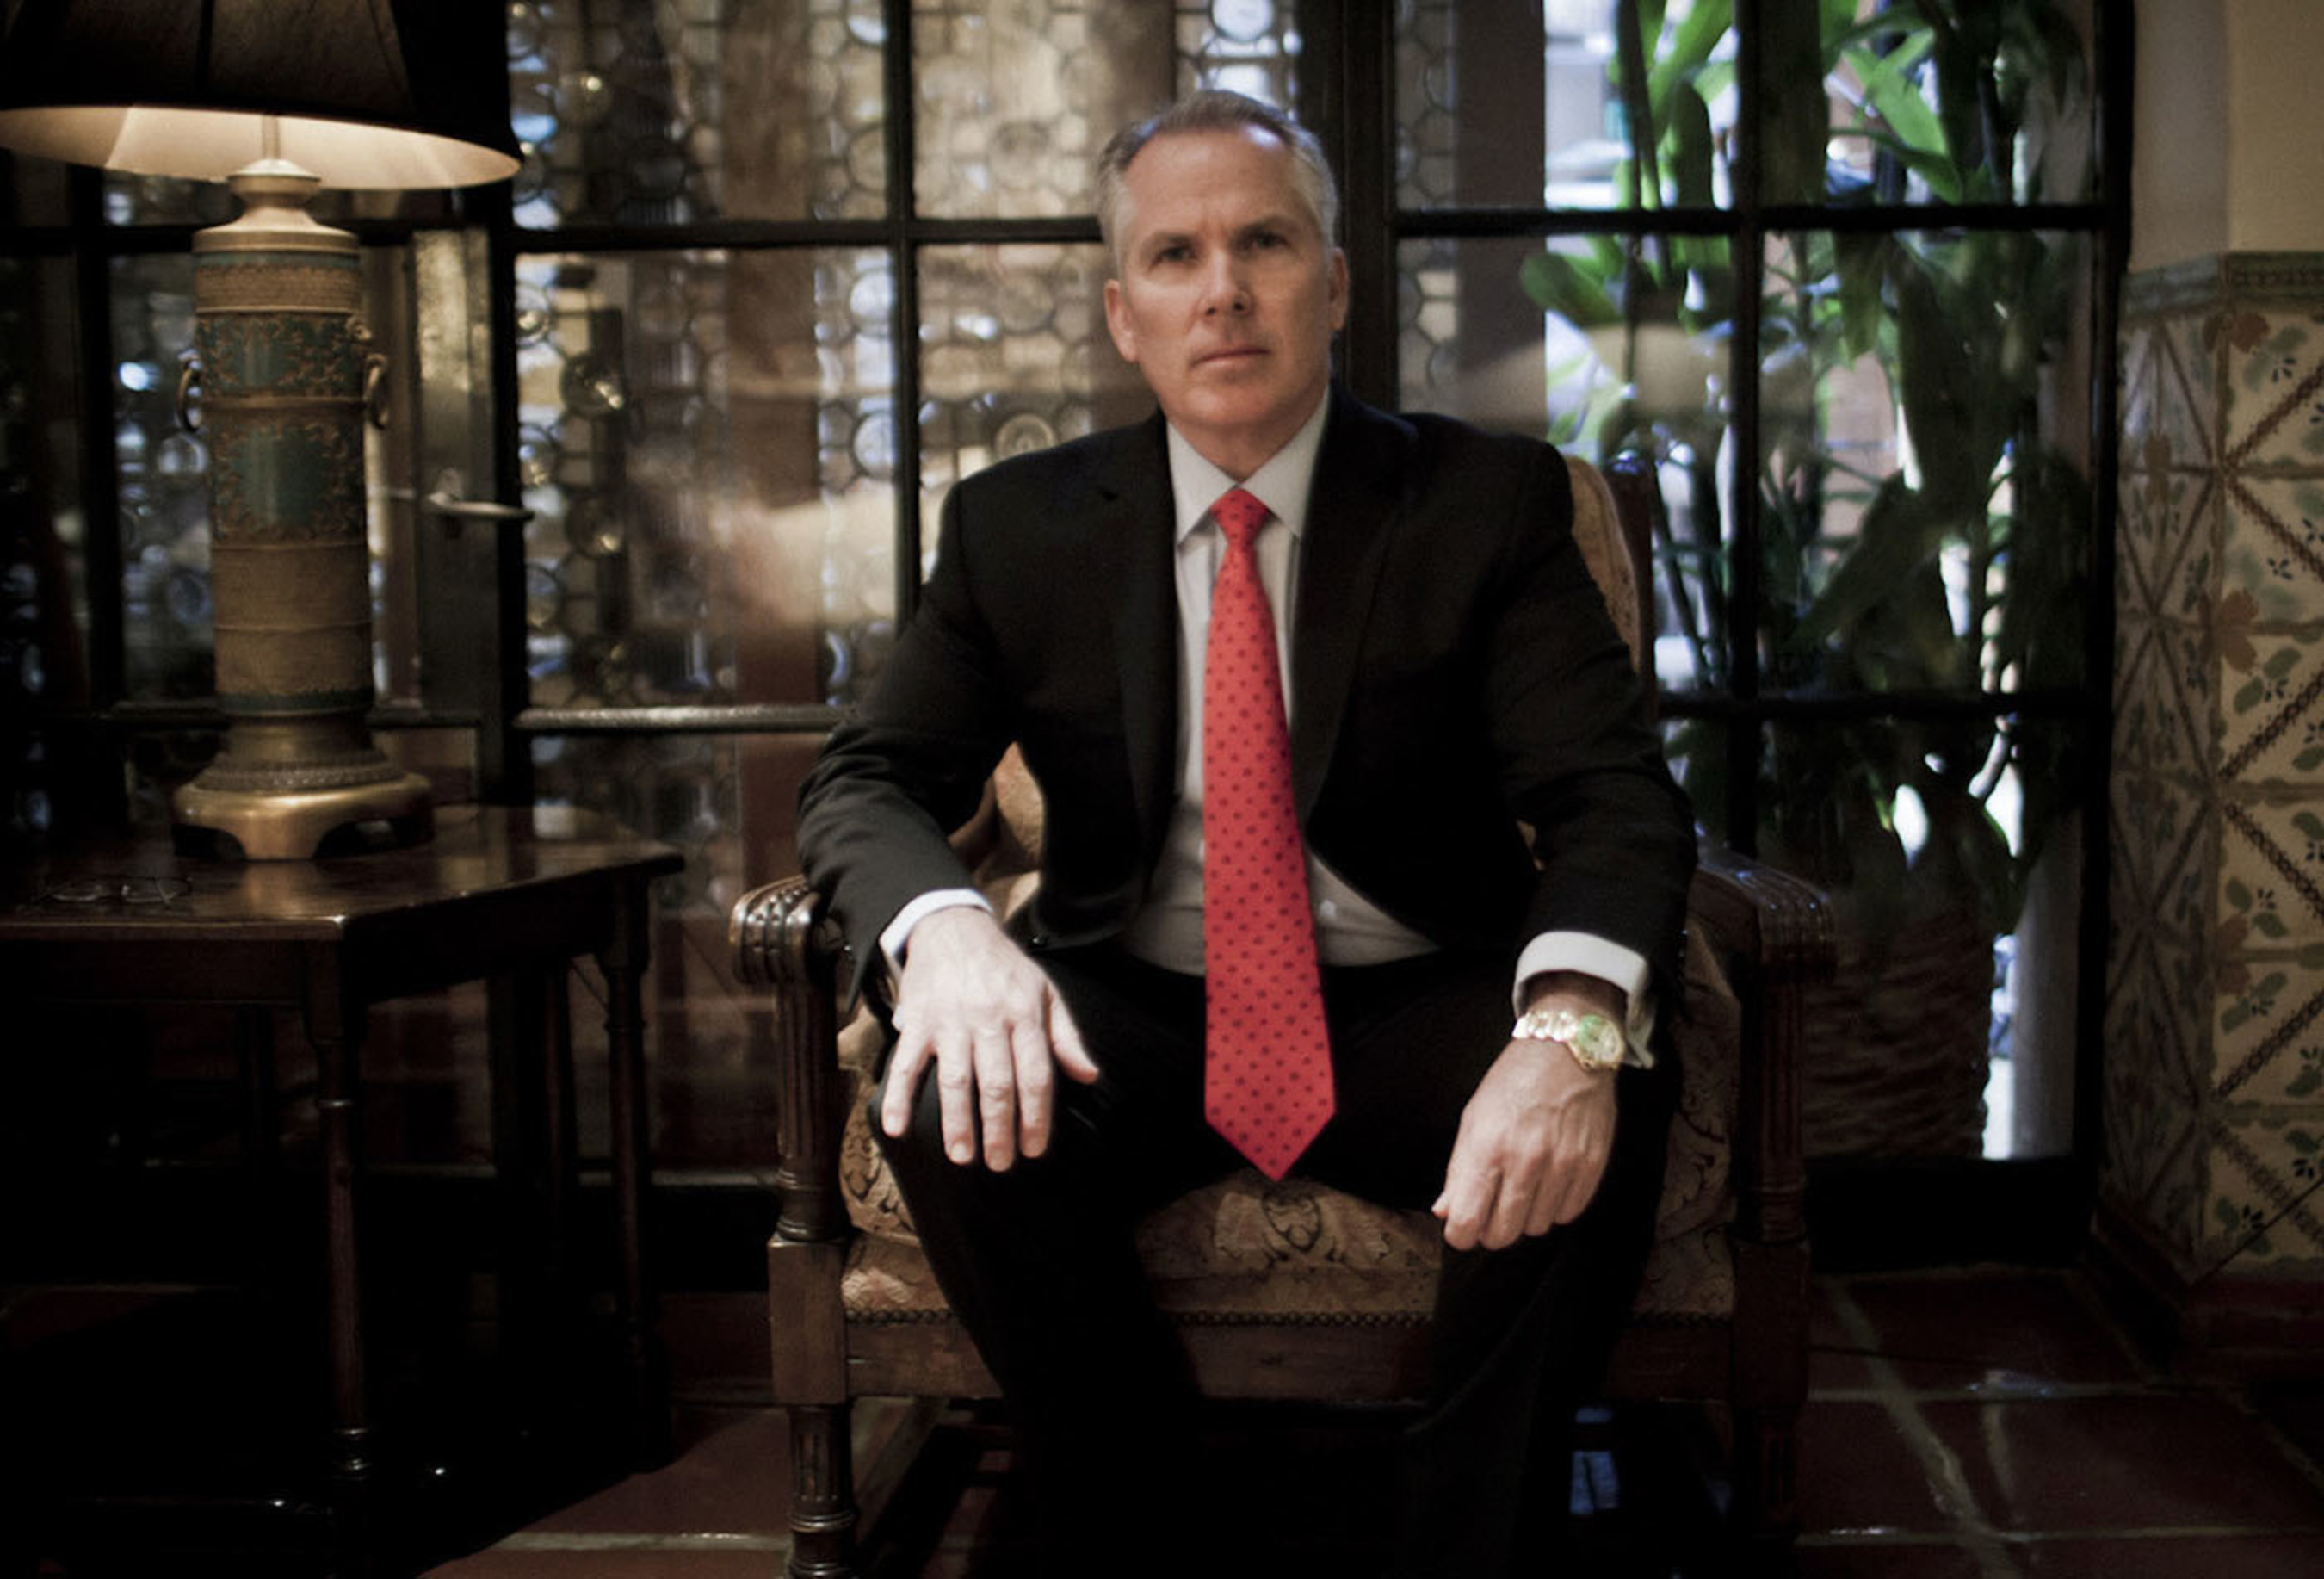 Thomas J Henry Injury Attorneys Client Awarded 67